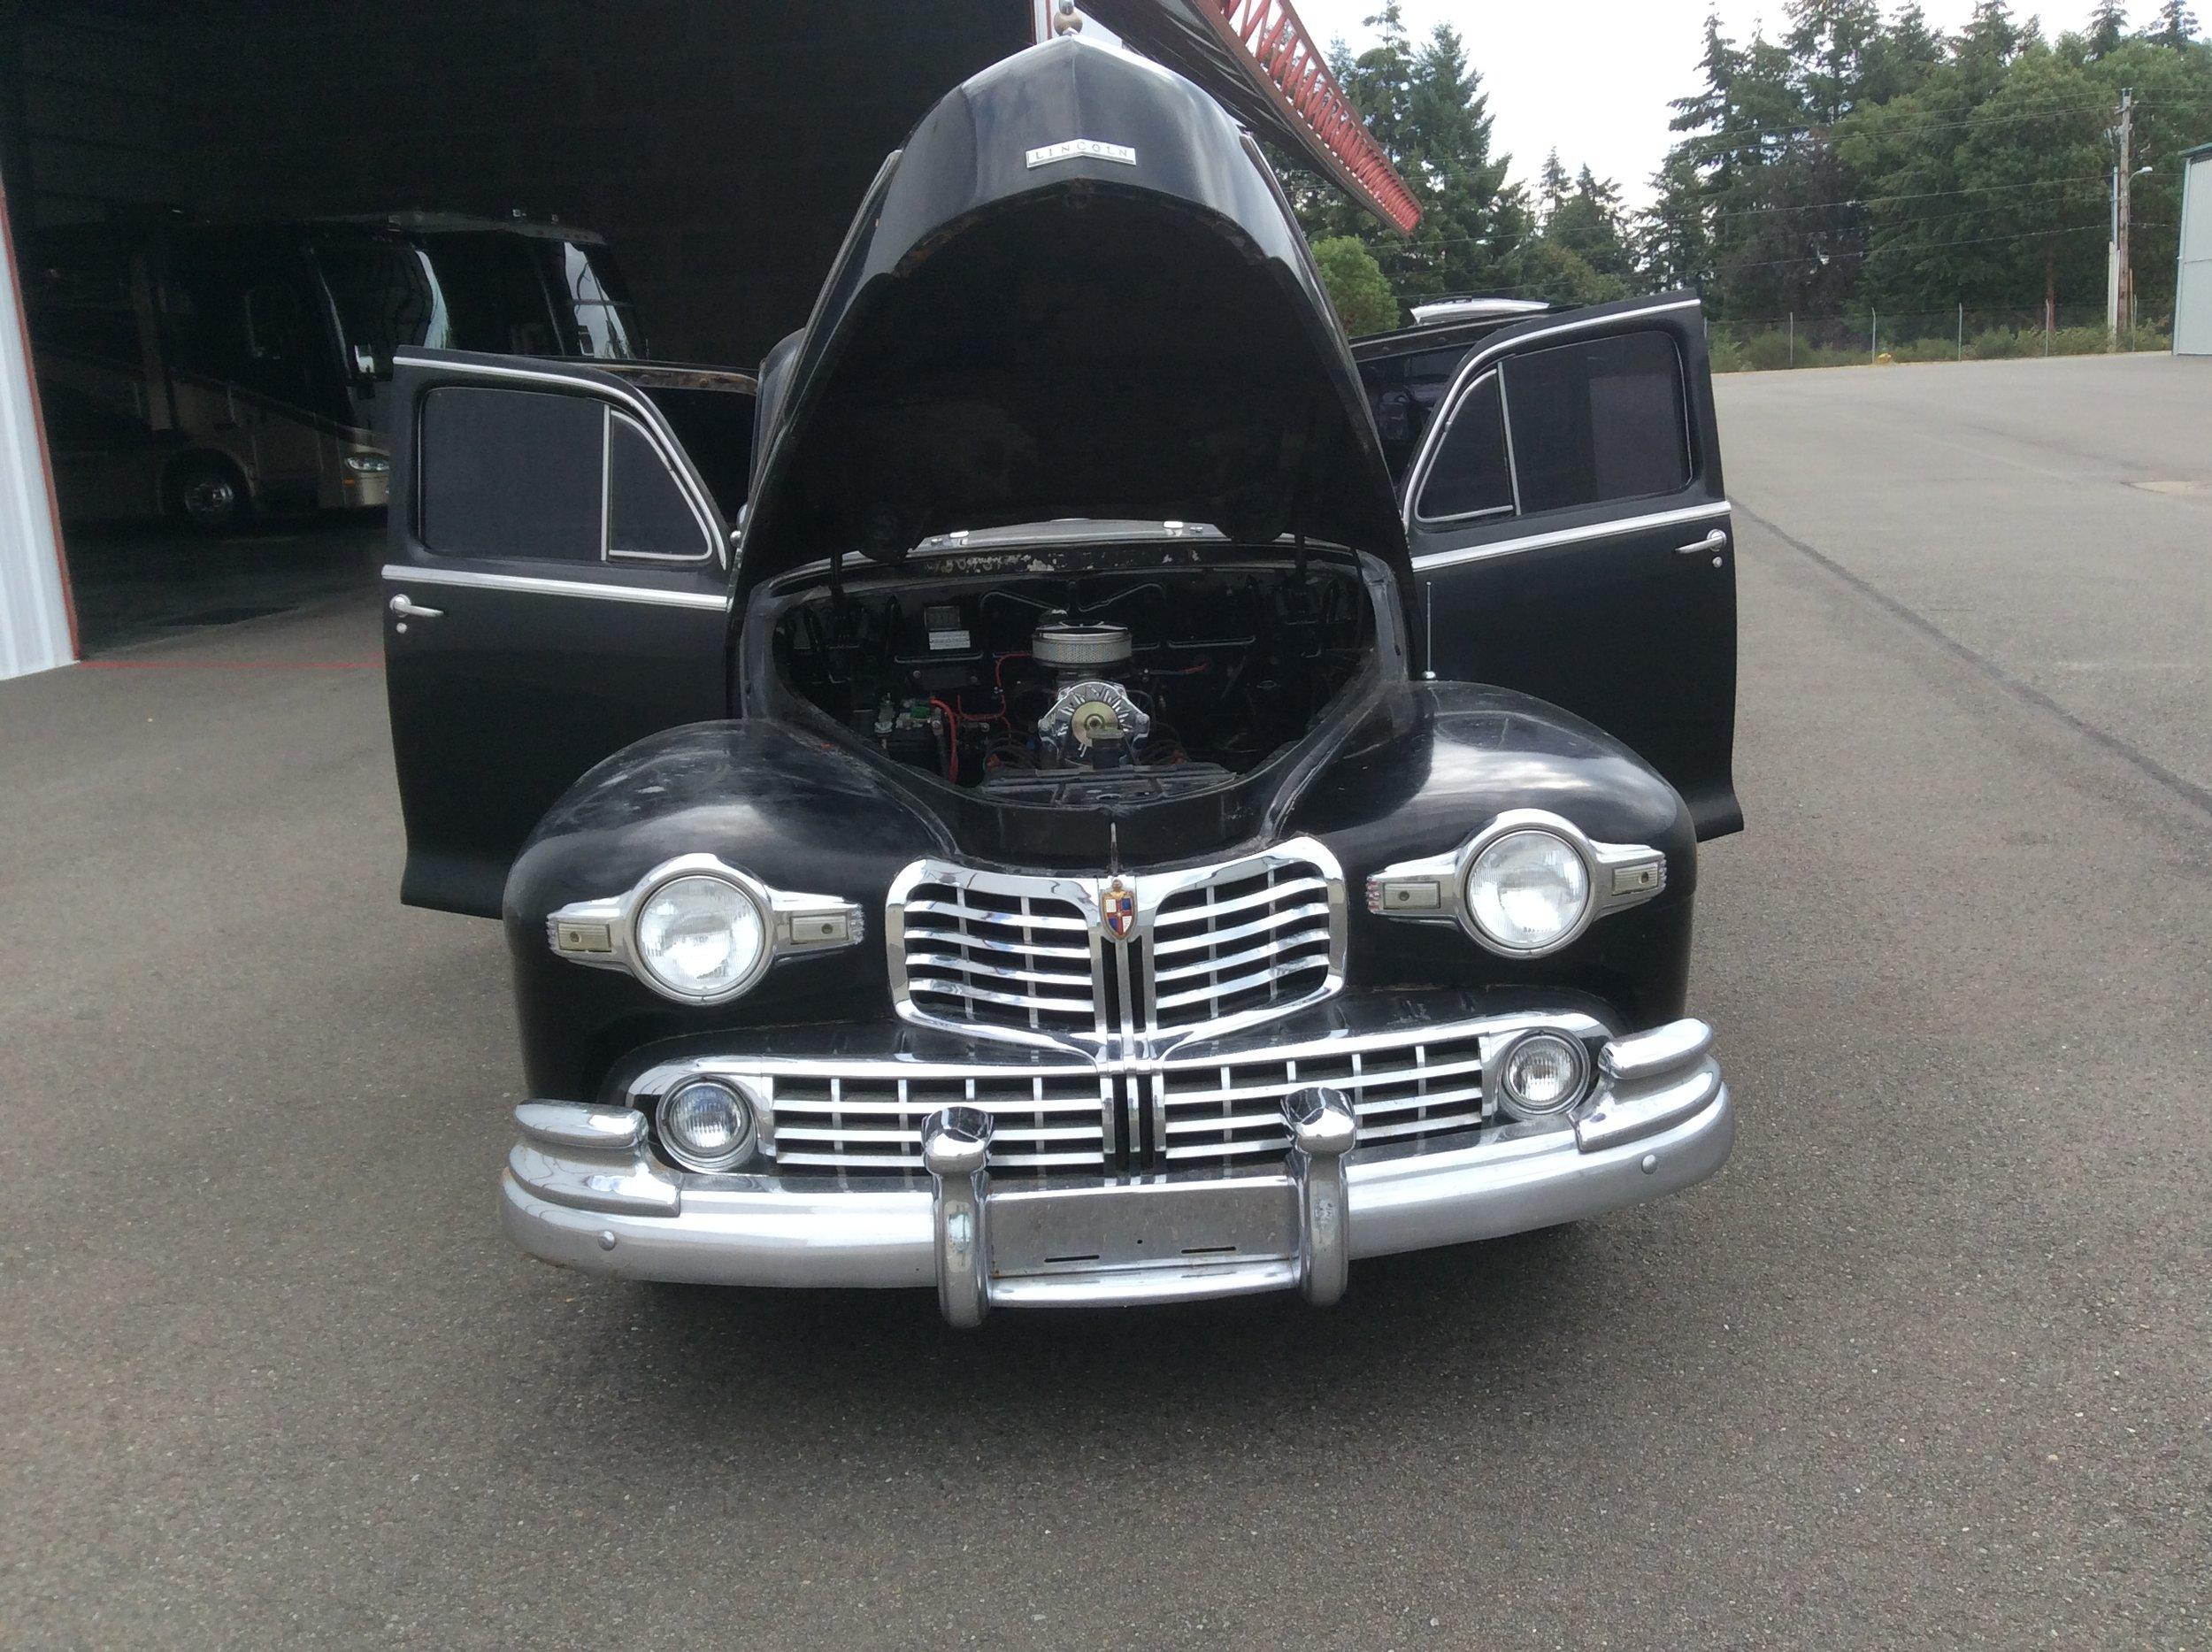 1948 Lincoln Zephyr (101).JPG